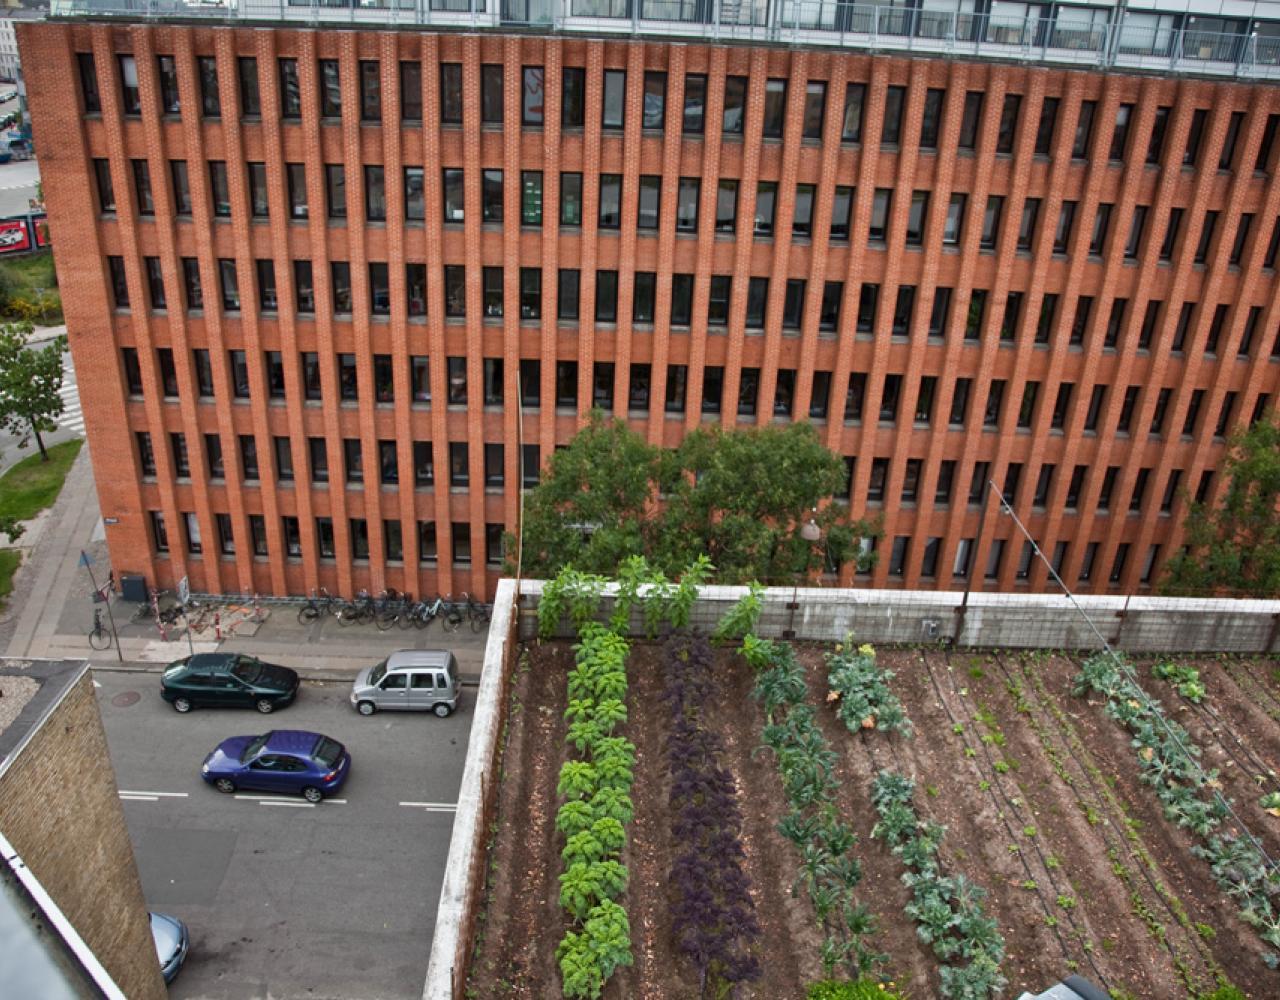 østergro tagfarm Foto: Bent Larsen